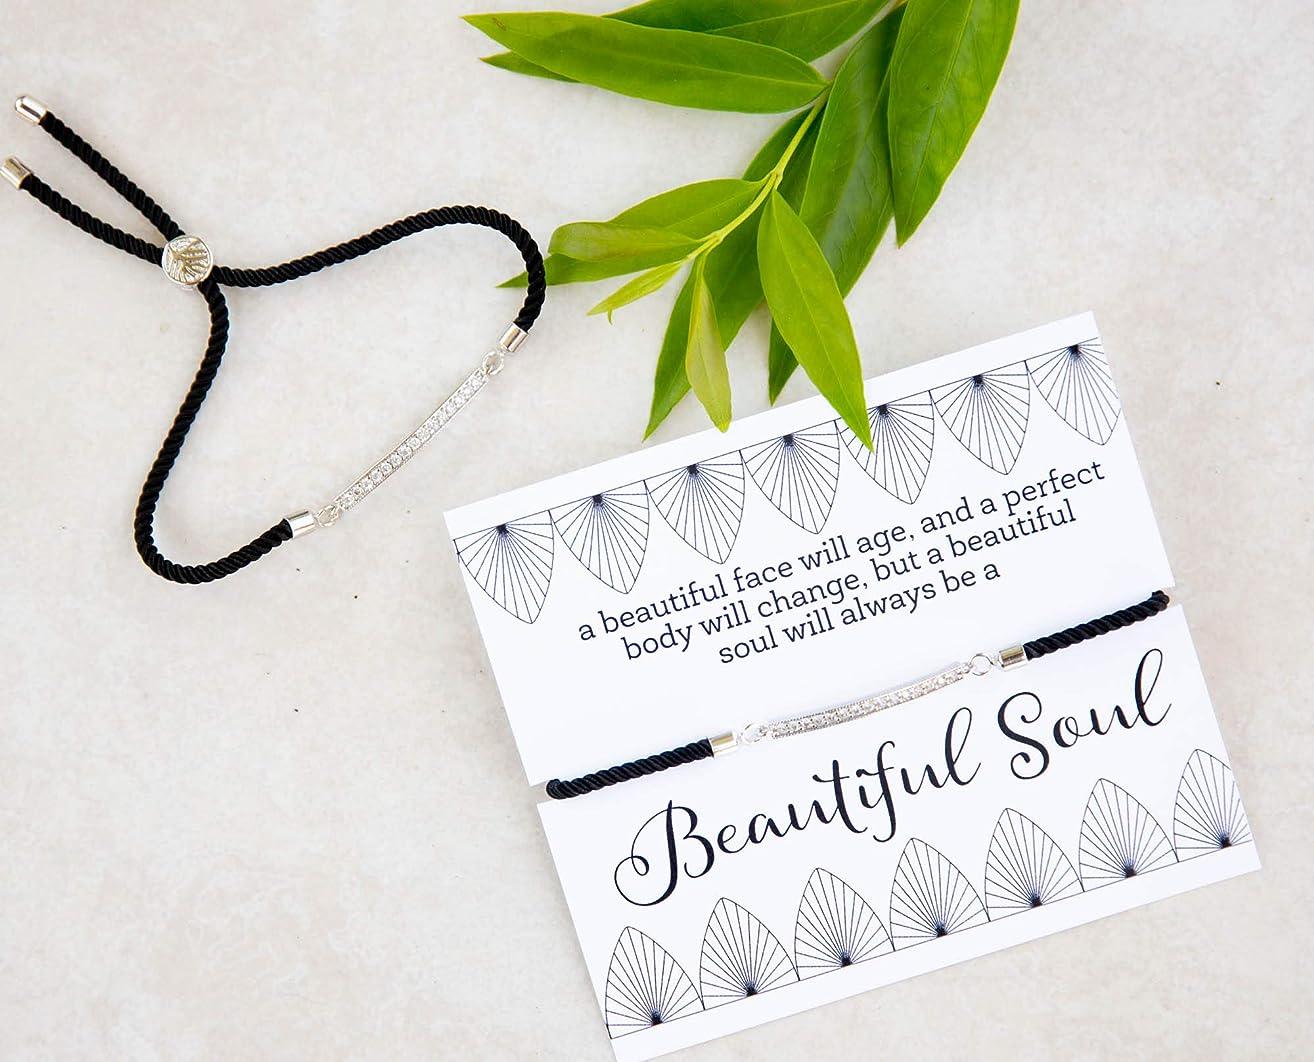 Bolo Silver-Plated Cubic Zirconia Crystal Bar Slide Bracelet Black Inspirational Gift